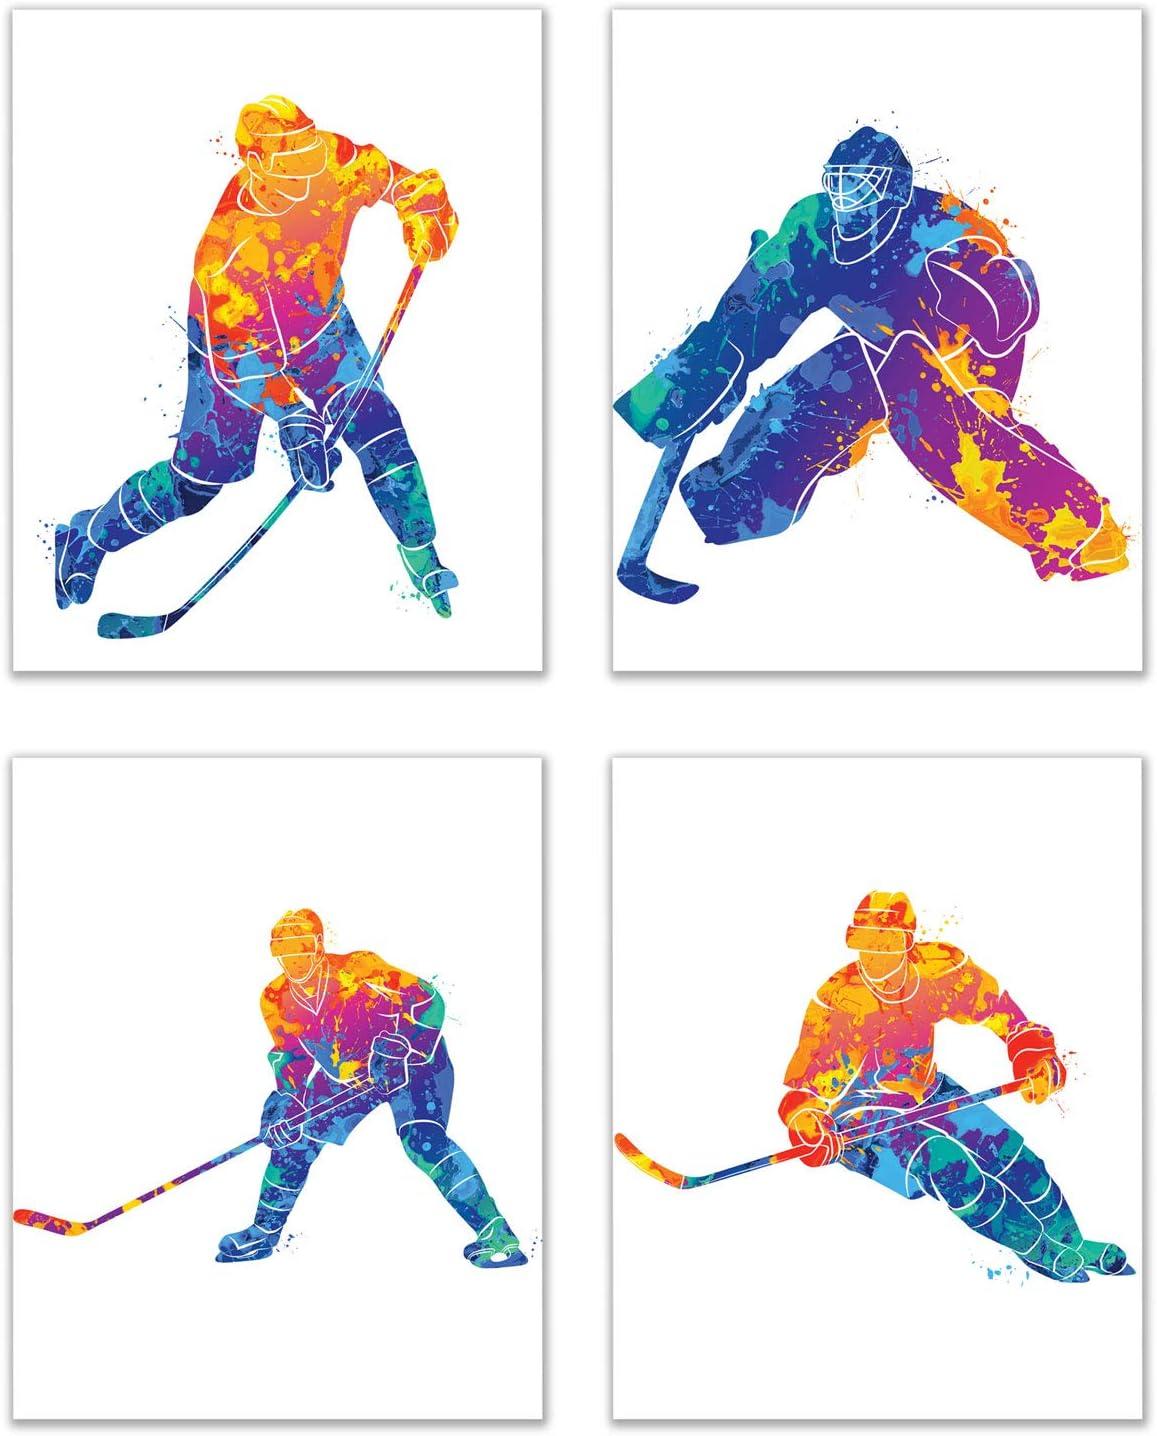 Hockey Watercolor Wall Art Decor Prints - Set of 4 (8x10) Inch Unframed Poster Photos - Bedroom